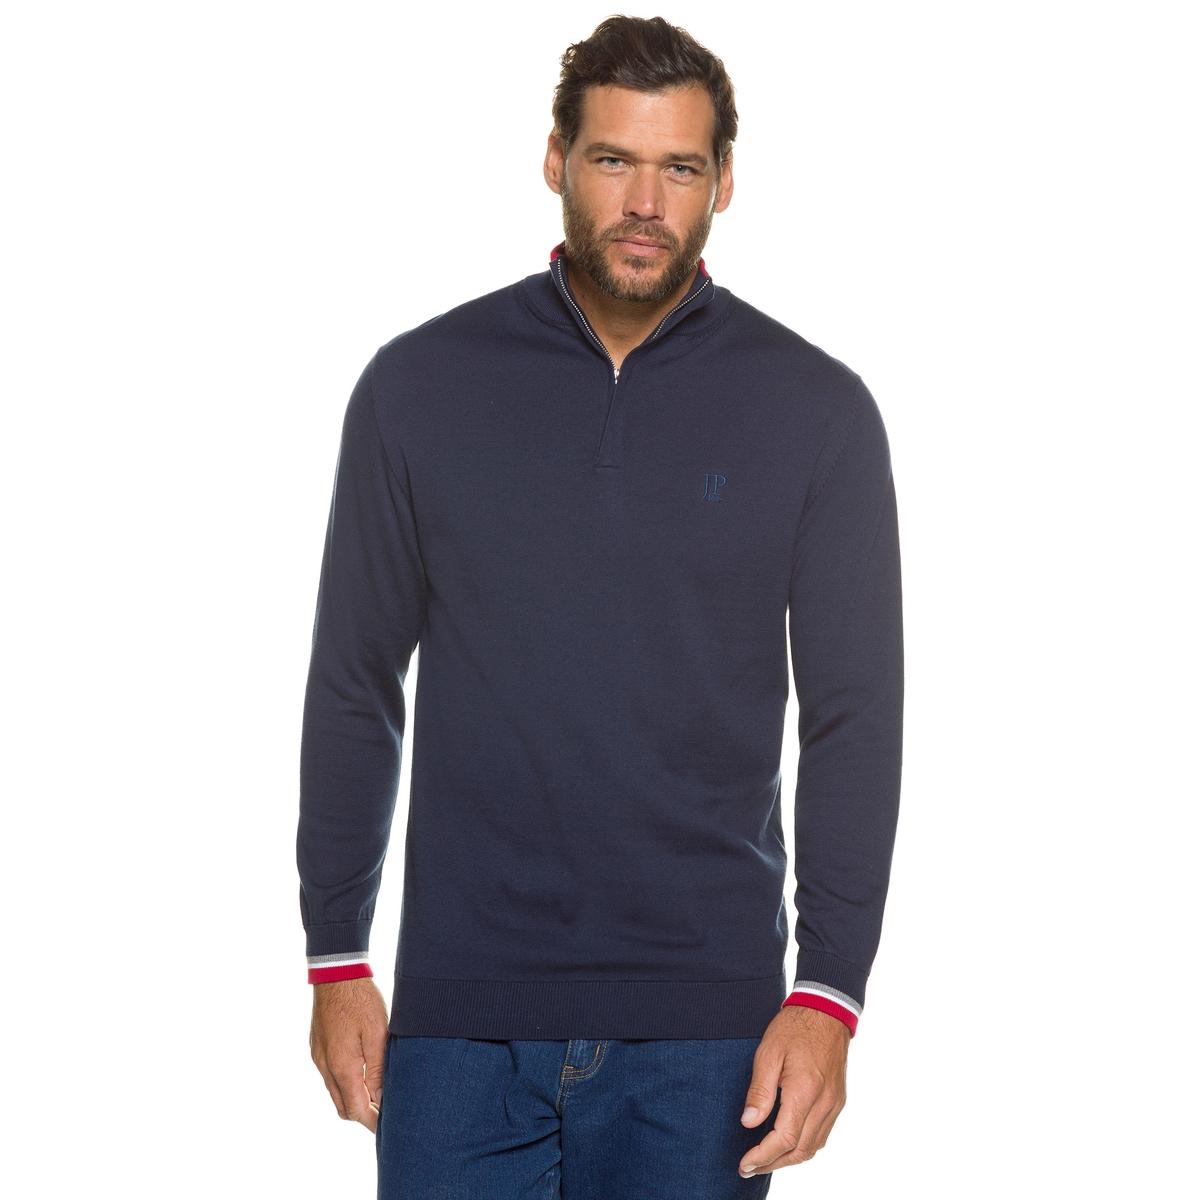 Пуловер<br><br>Цвет: синий<br>Размер: 7XL.3XL